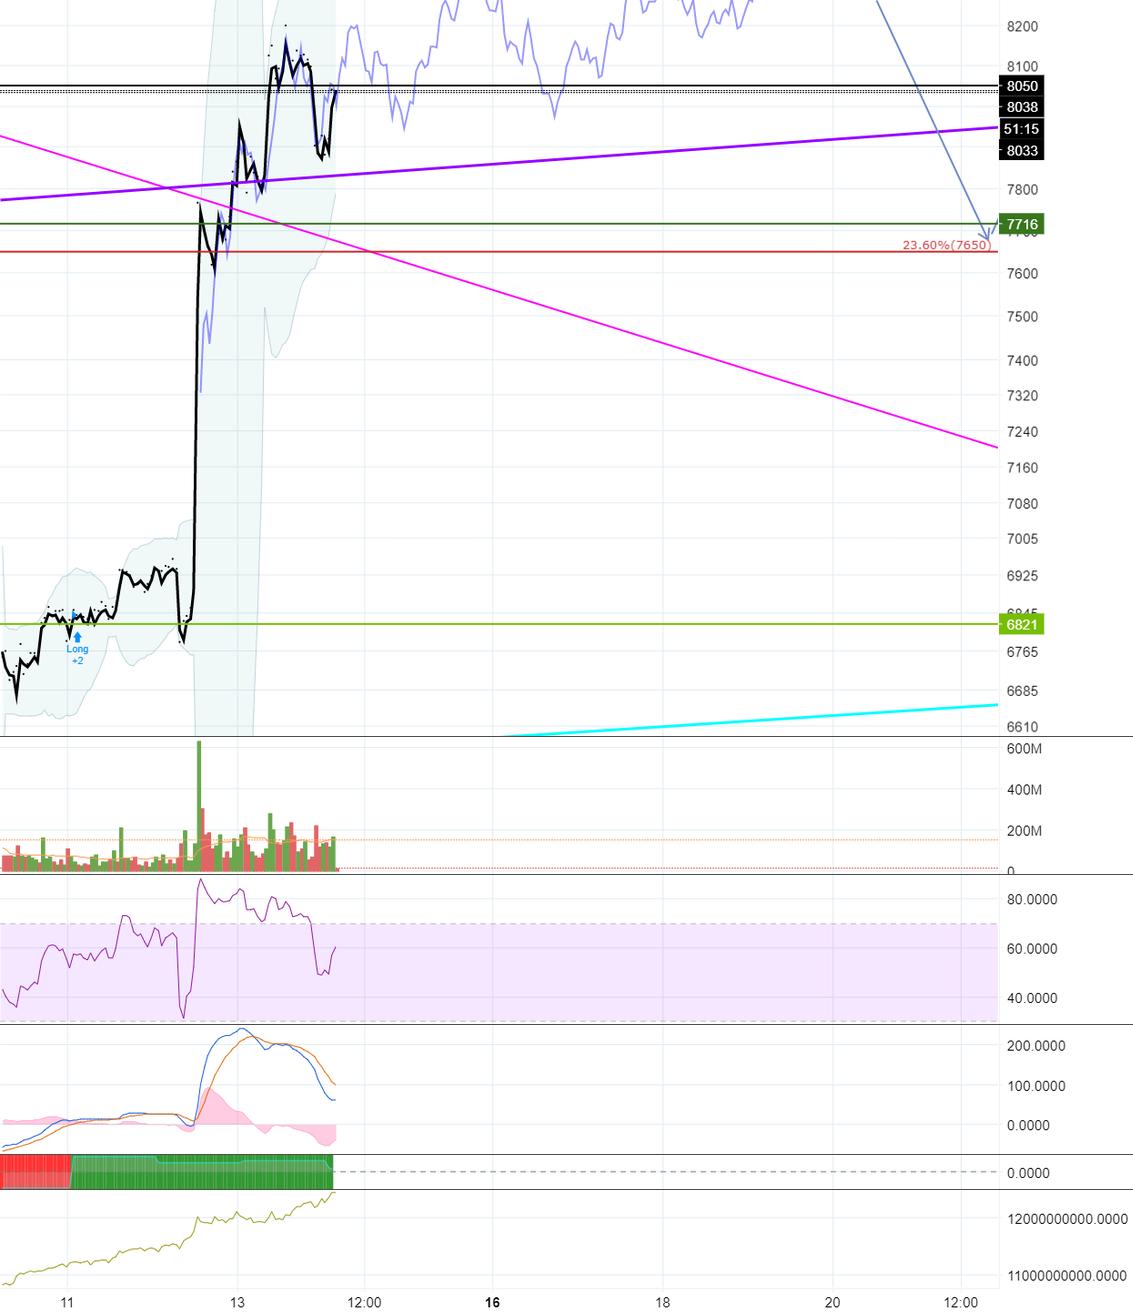 Feb 6k low overlapped chart, working good so far!